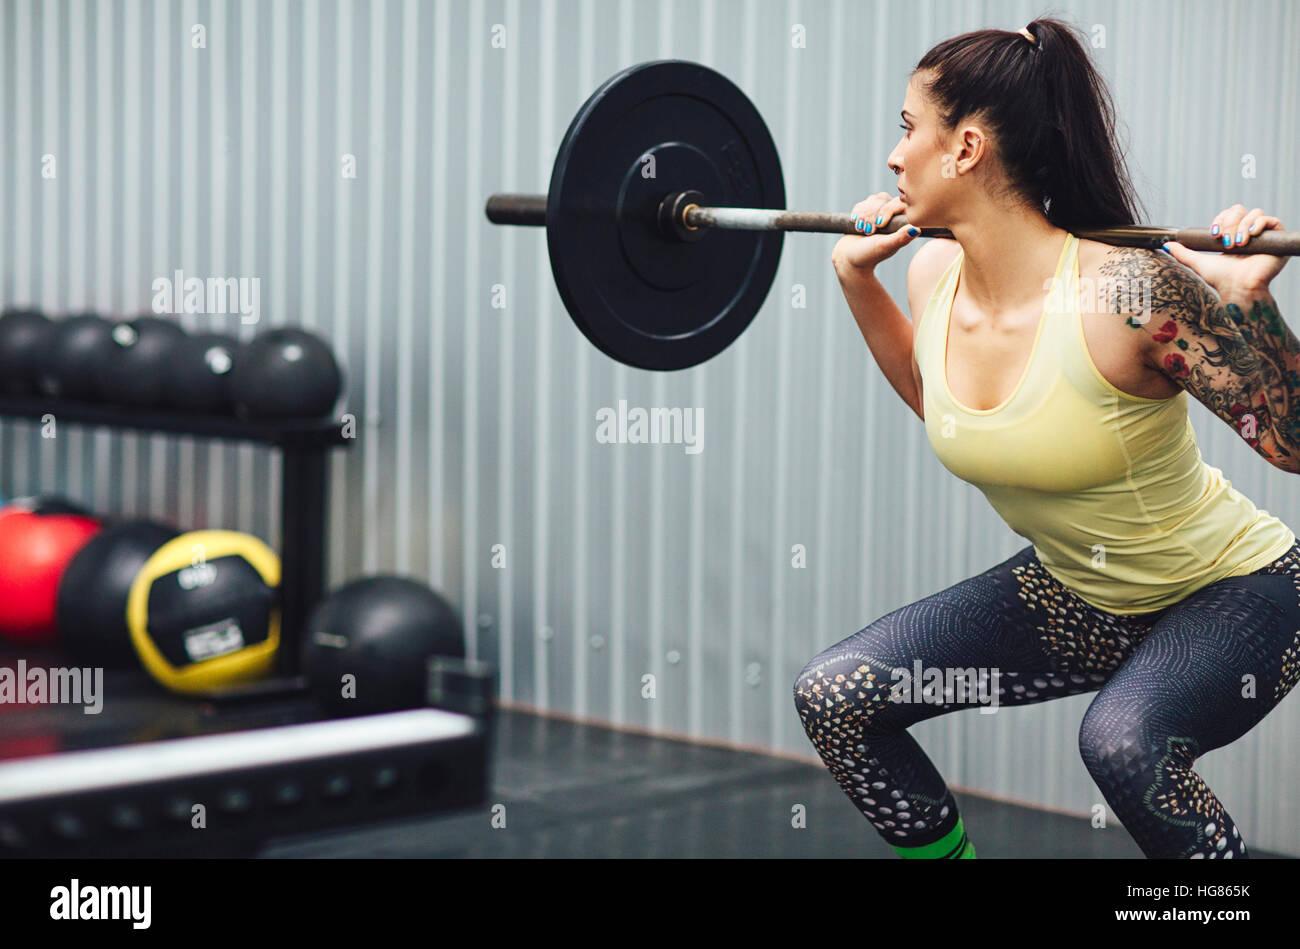 Mujer barbell en gimnasio con pesas Imagen De Stock